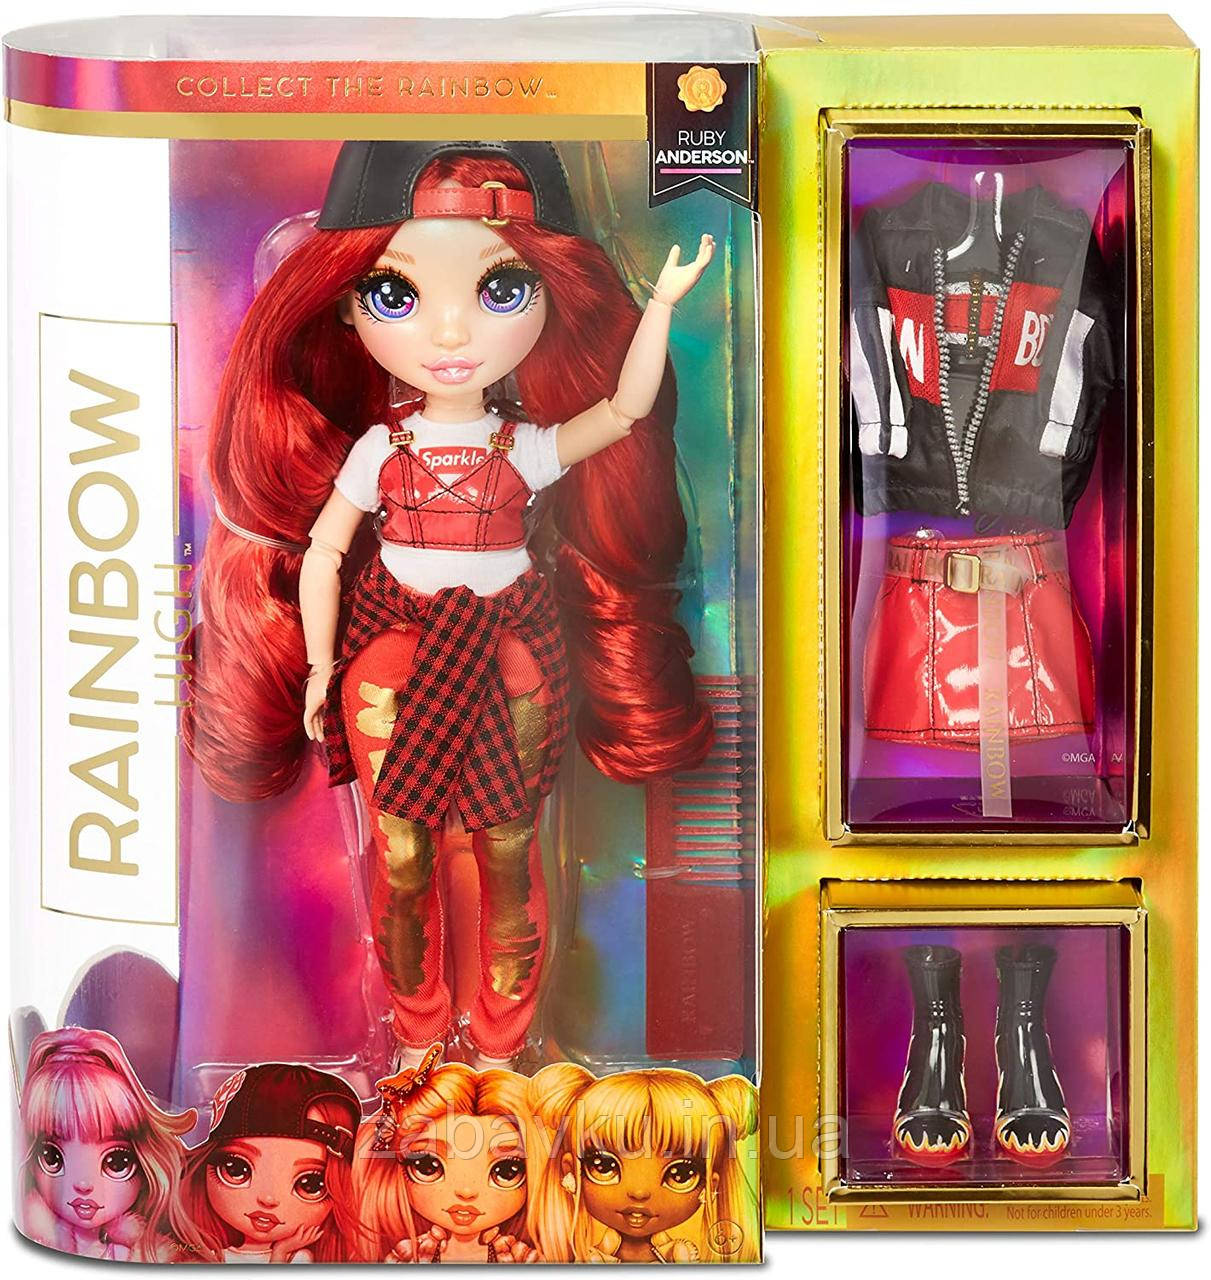 Rainbow Surprise Rainbow High Ruby Anderson Кукла Рейнбоу Хай Рейнбоу Руби Андерсон